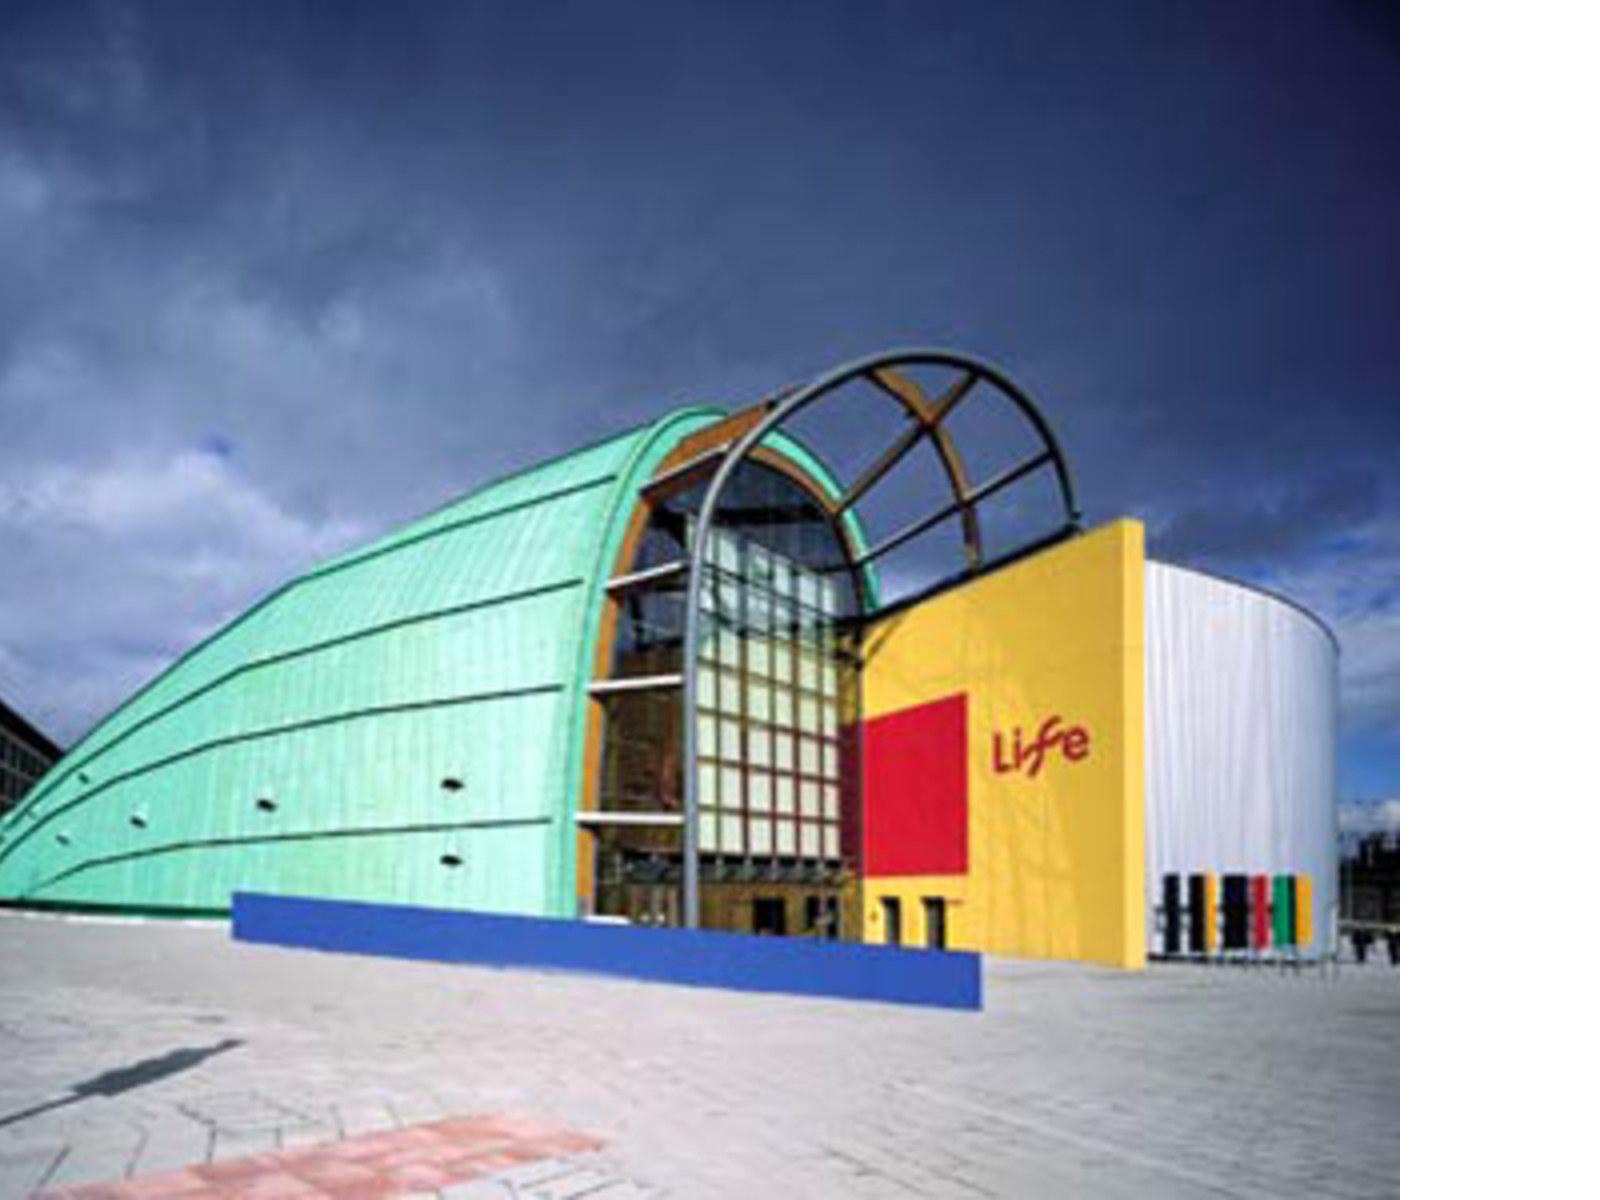 Terry Farrell<br> International Centre for Life, Grande-Bretagne, 1996